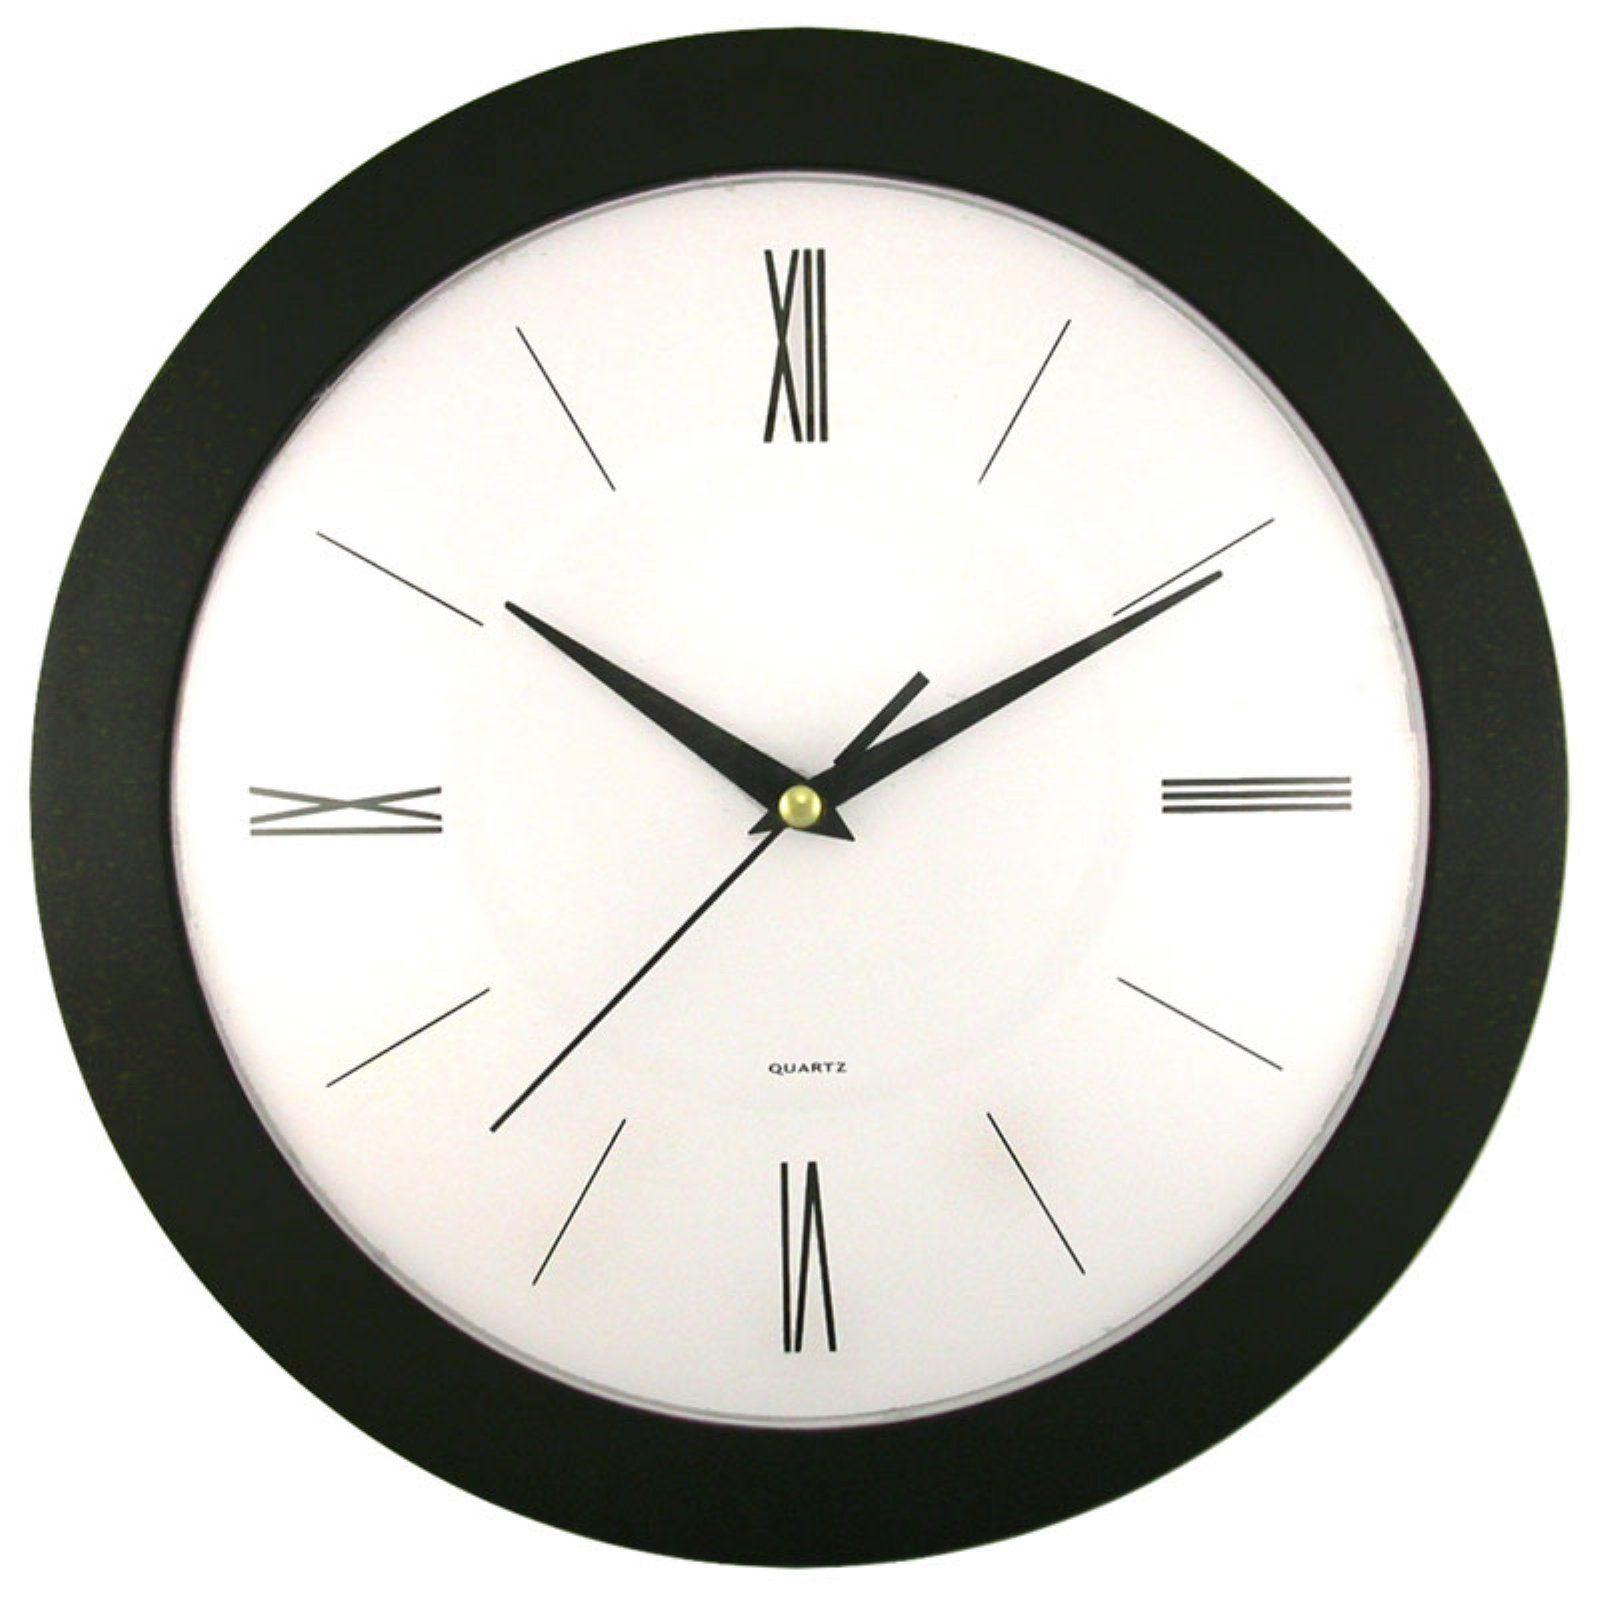 Heidelberg 12 Inch Wall Clock Black Wall Clock Wall Clock Modern Wall Clock